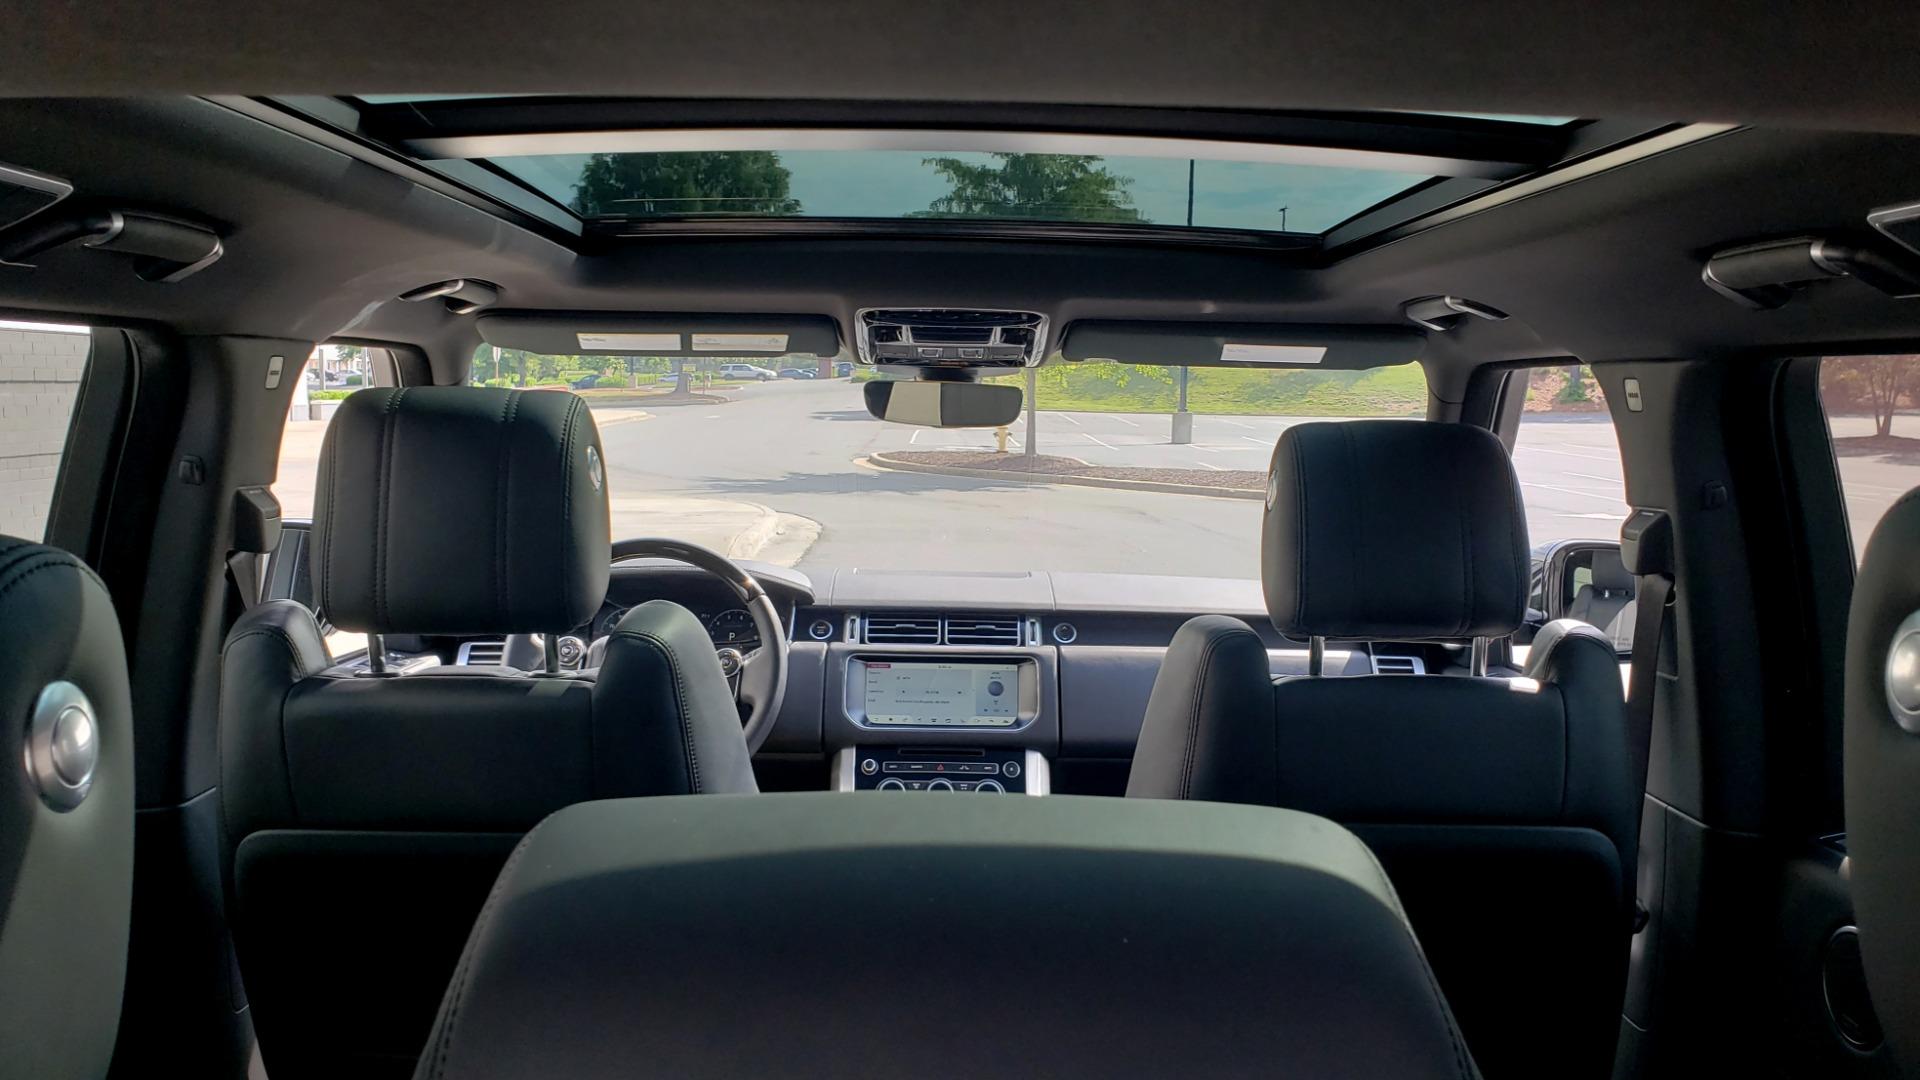 Used 2017 Land Rover RANGE ROVER SC V8 / VISION ASST / DRIVE PKG / MERIDIAN SOUND / PANO-ROOF / NAV / BSM for sale $75,995 at Formula Imports in Charlotte NC 28227 23